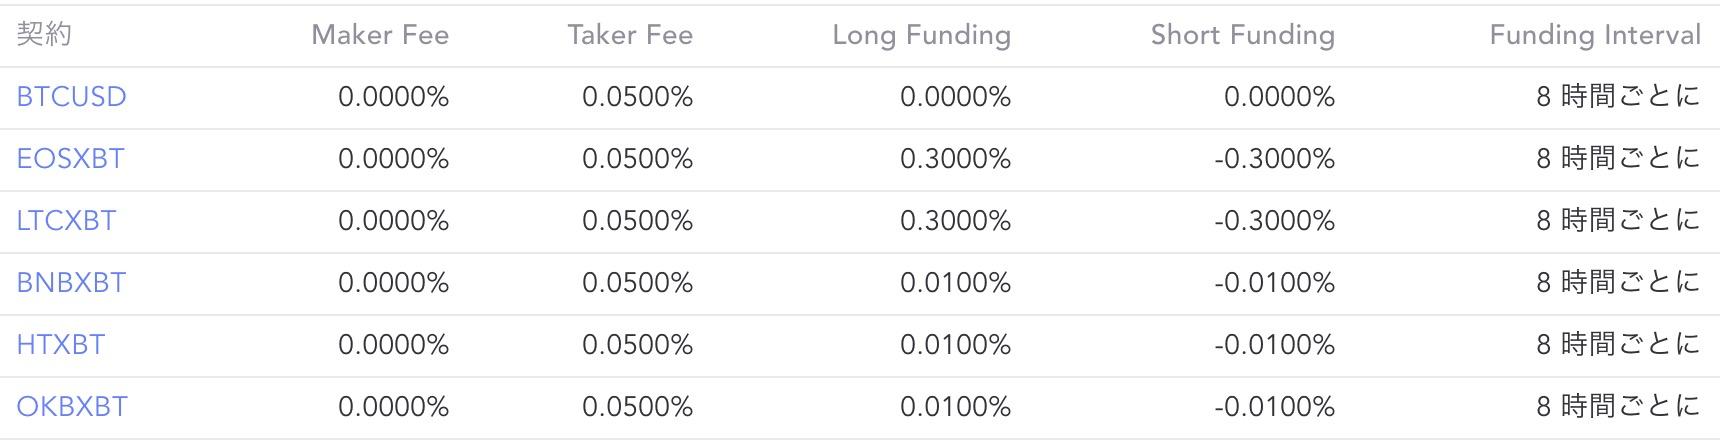 BaseFEX 仮想通貨 取引所 手数料